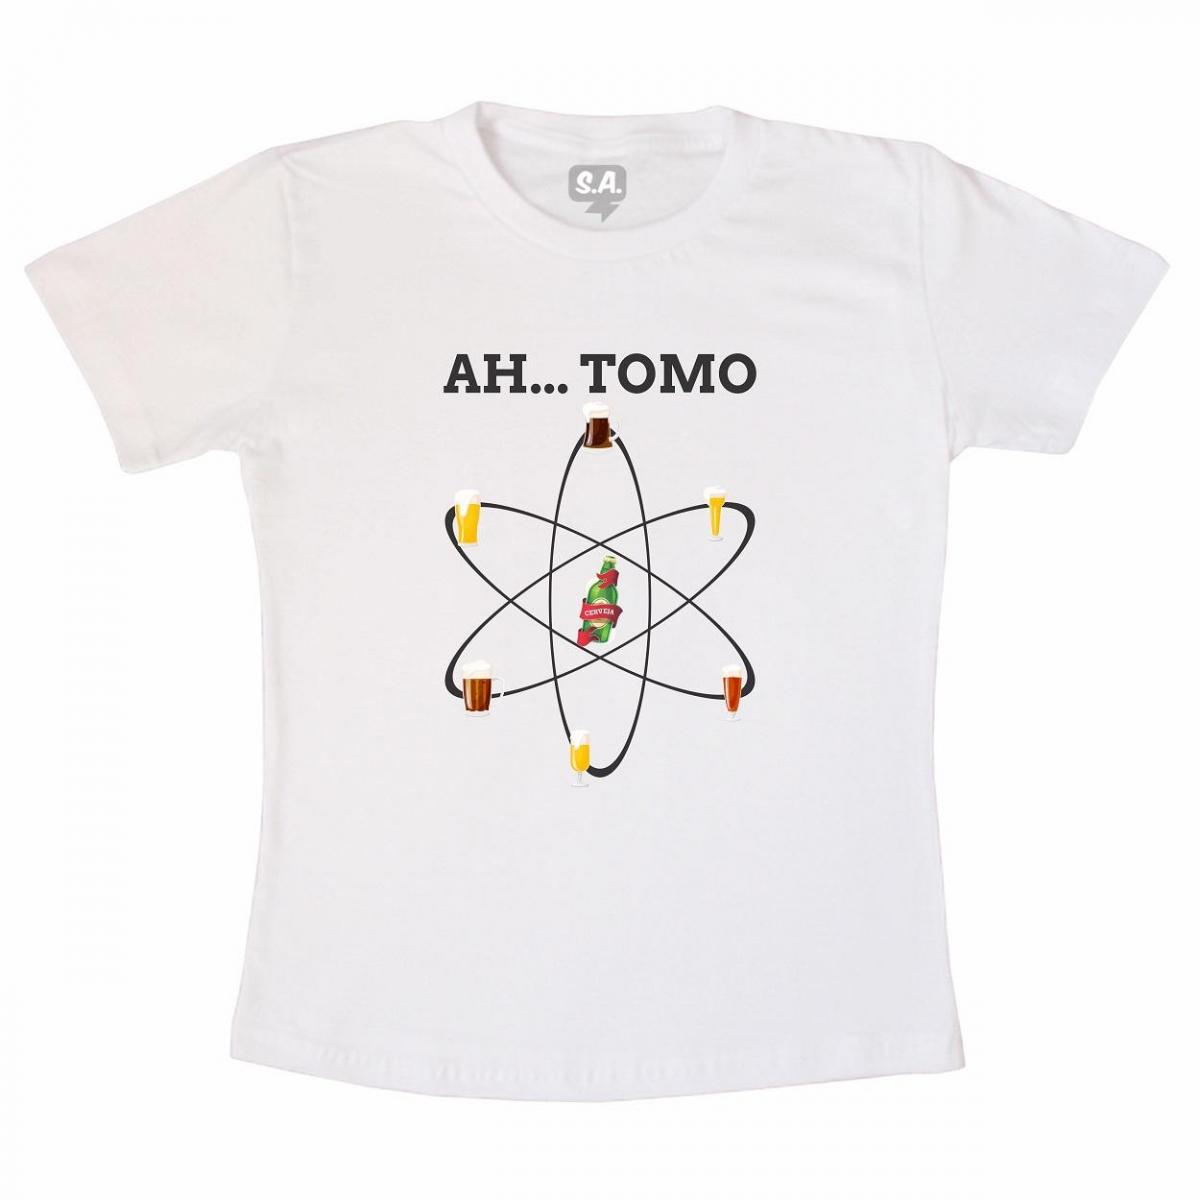 Camiseta AH...TOMO na Camiseteria S.A. 3366415fe33